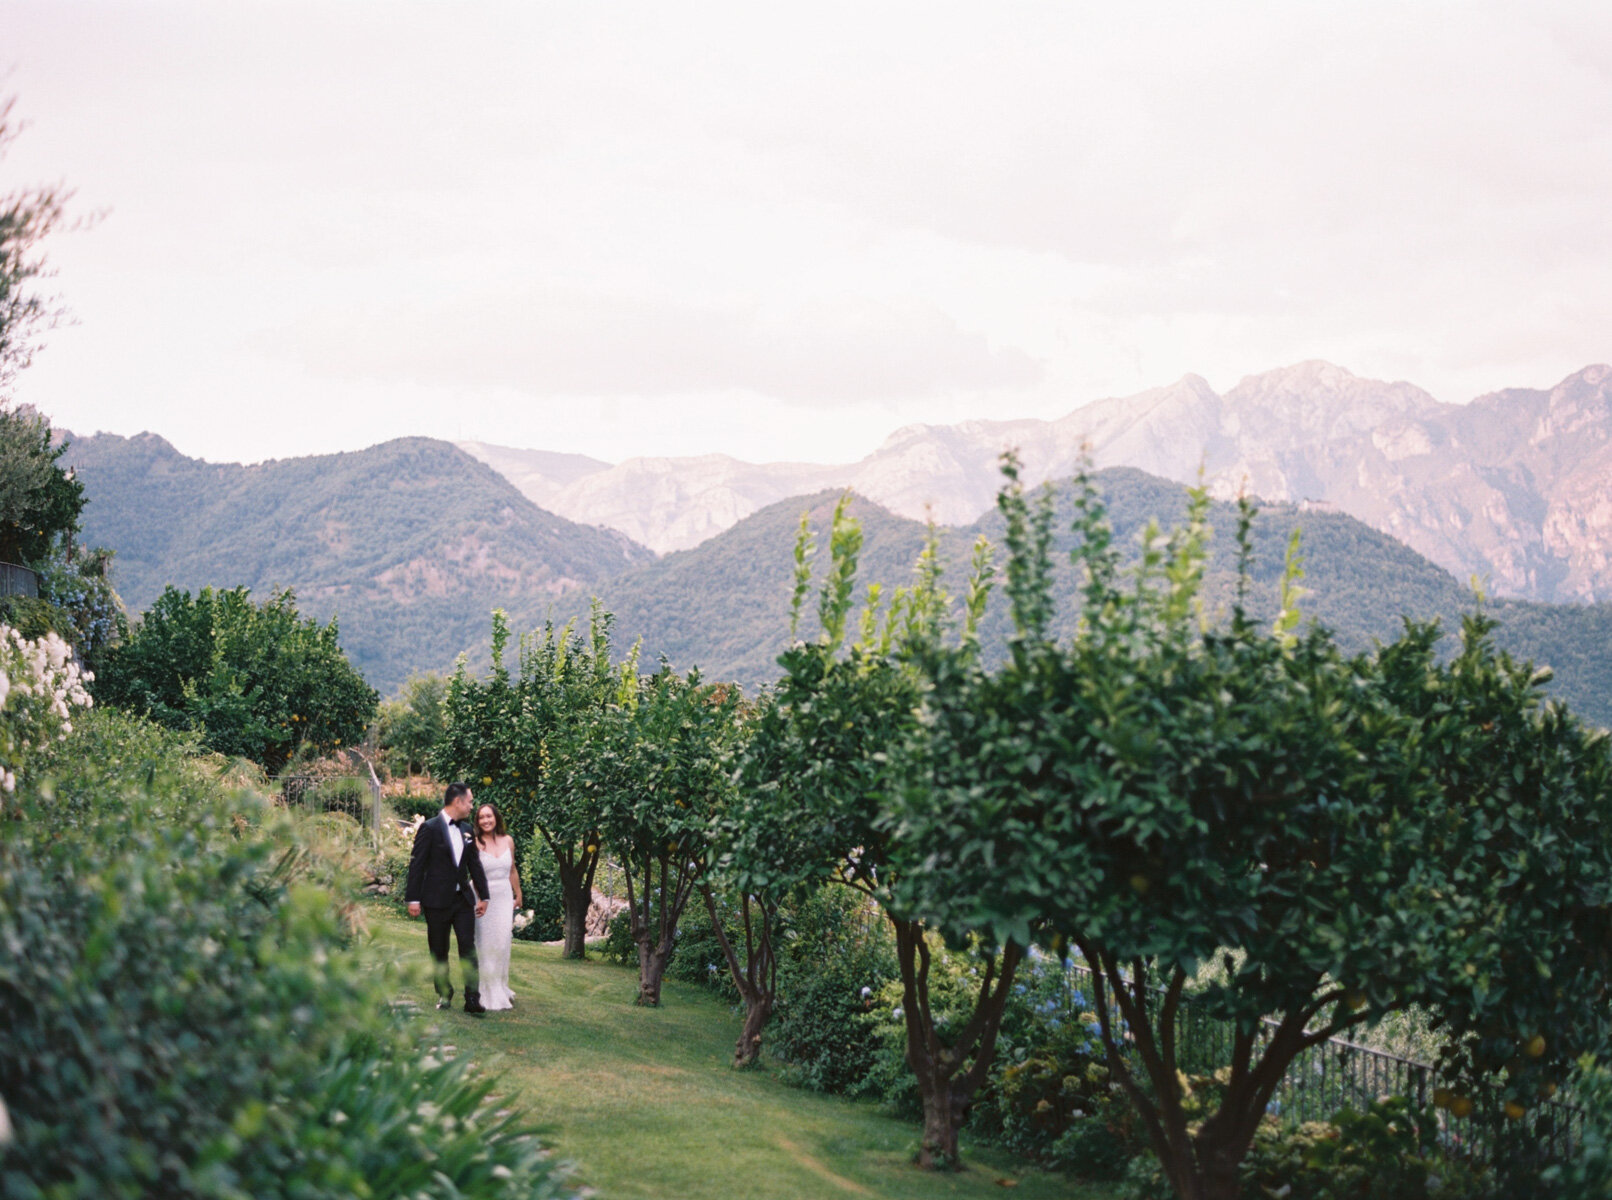 Belmond-Hotel-Caruso-ravello-elopement-Katie-Grant-destination-wedding (39 of 50).jpg